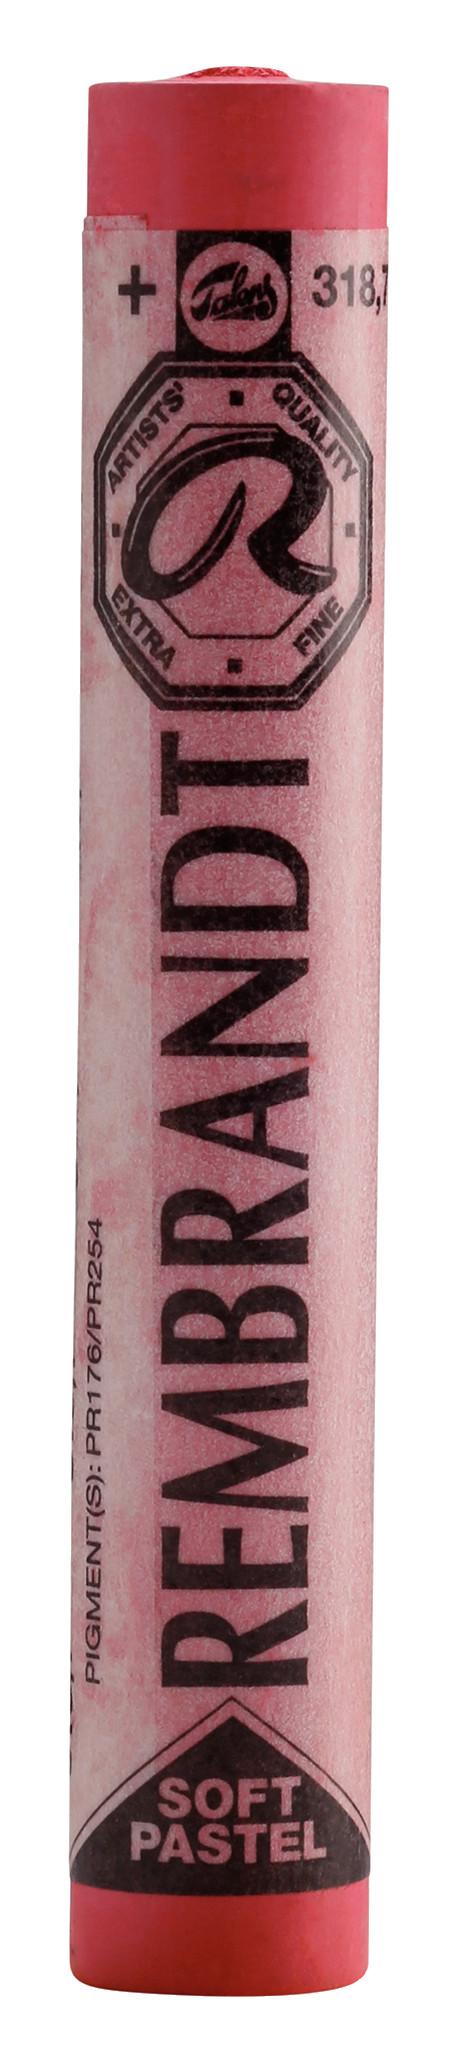 Rembrandt Soft Pastel Round Full Stick Carmine(7) (318.7)